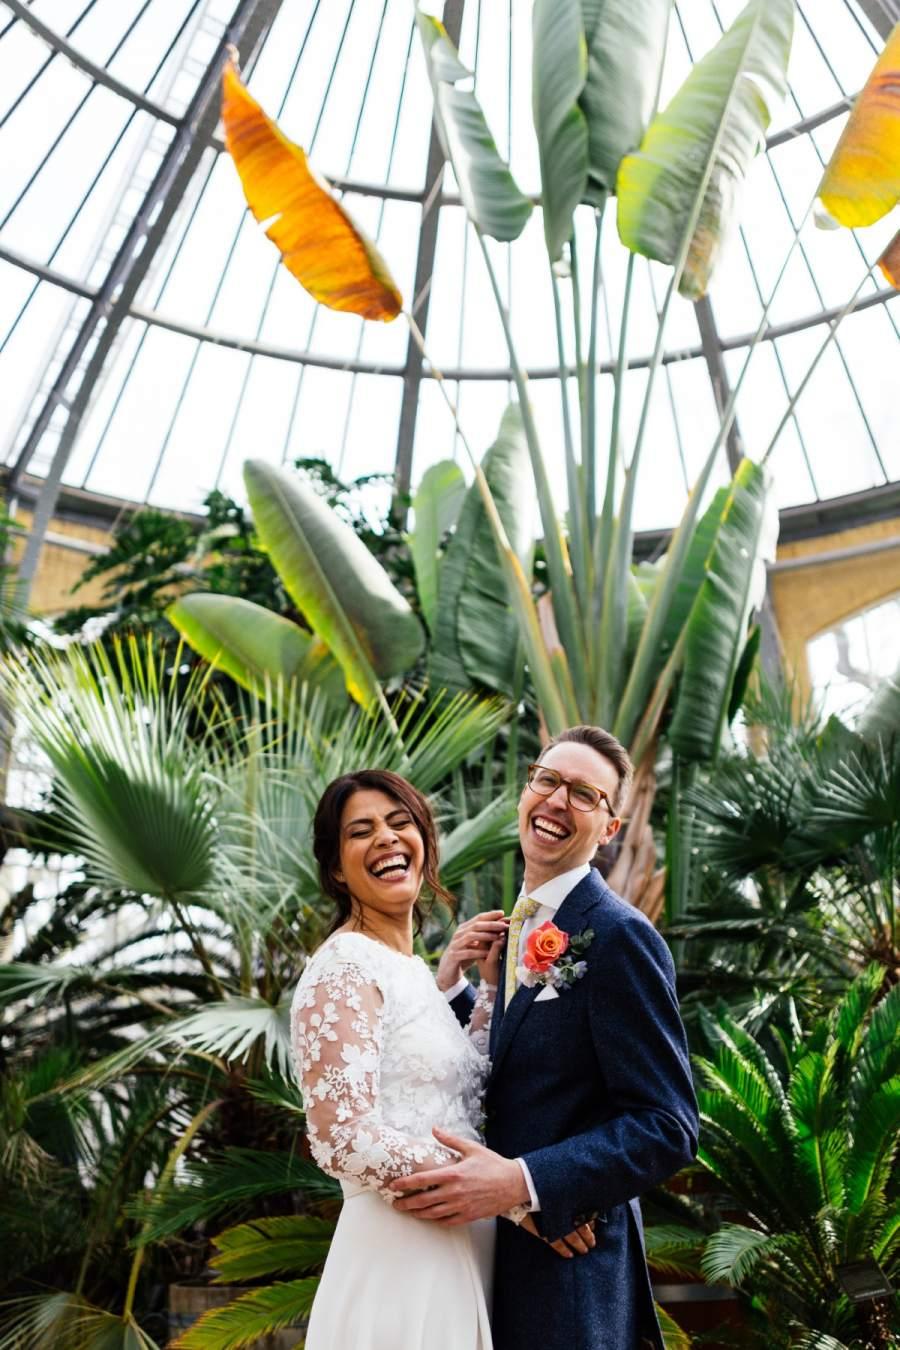 mariage-elisa-richard-hotel-drood-amsterdam-408.jpg